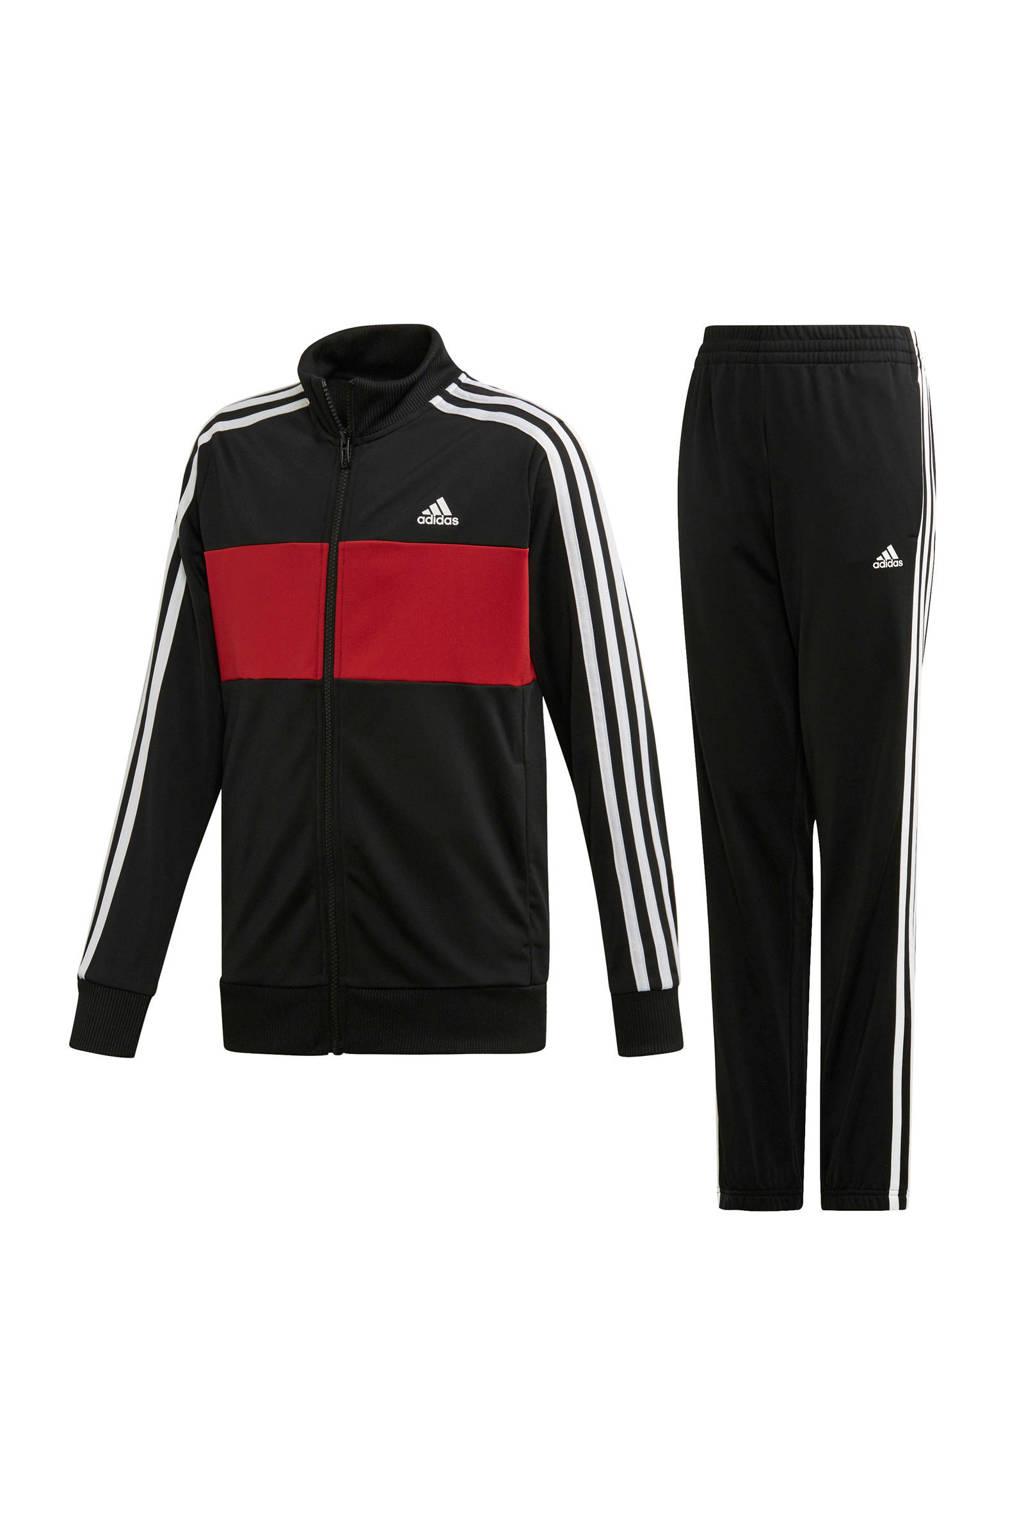 adidas performance   performance trainingspak zwart, Zwart/rood/wit